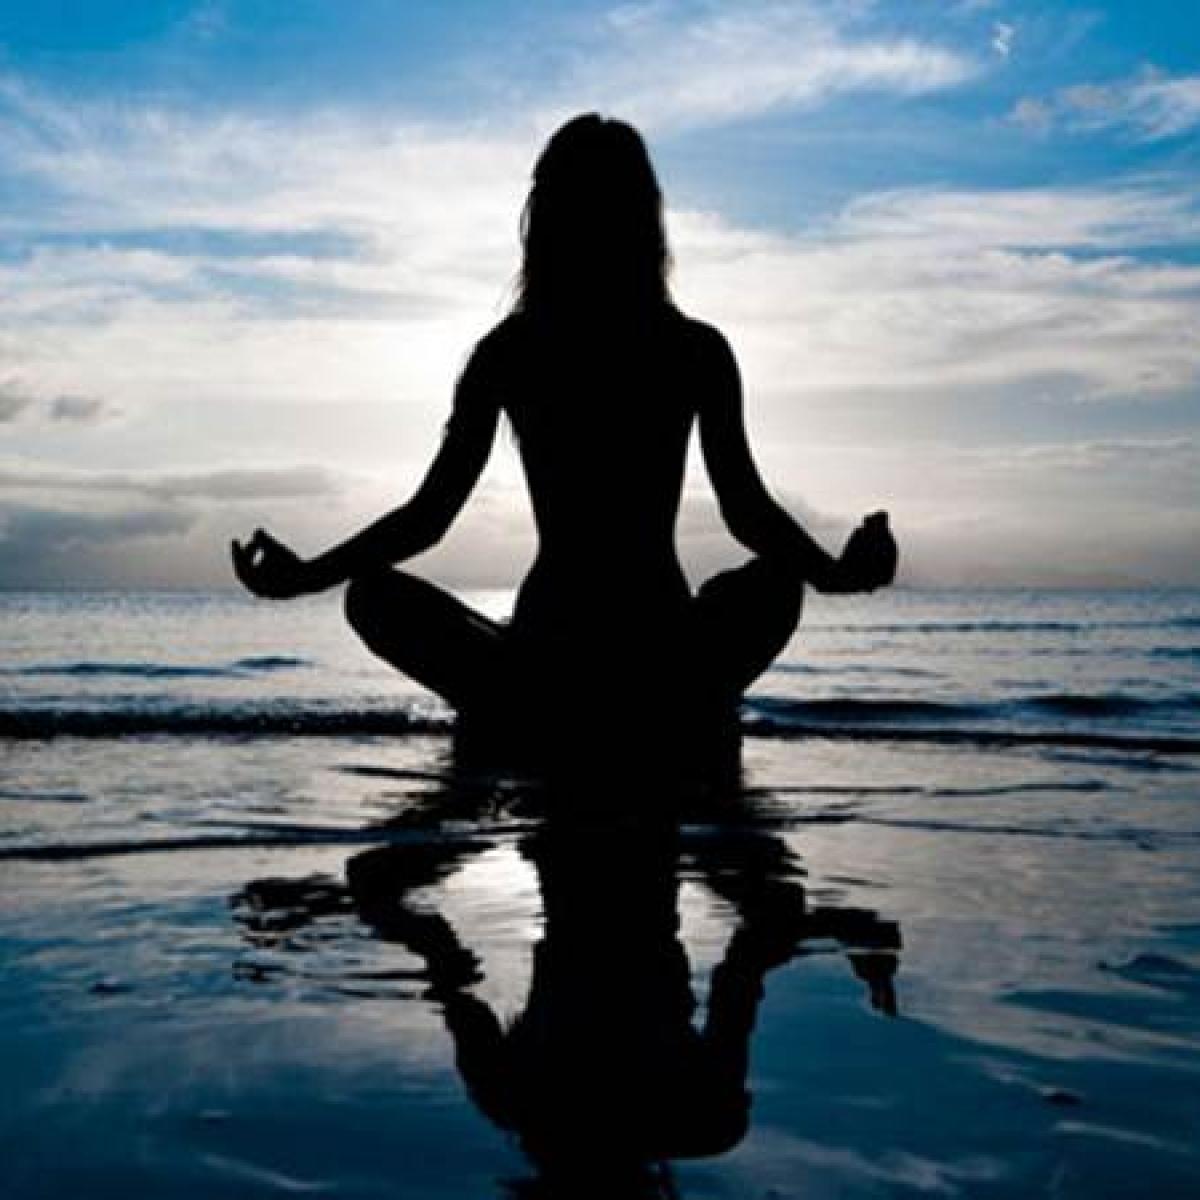 Meditation makes you more creative: Study